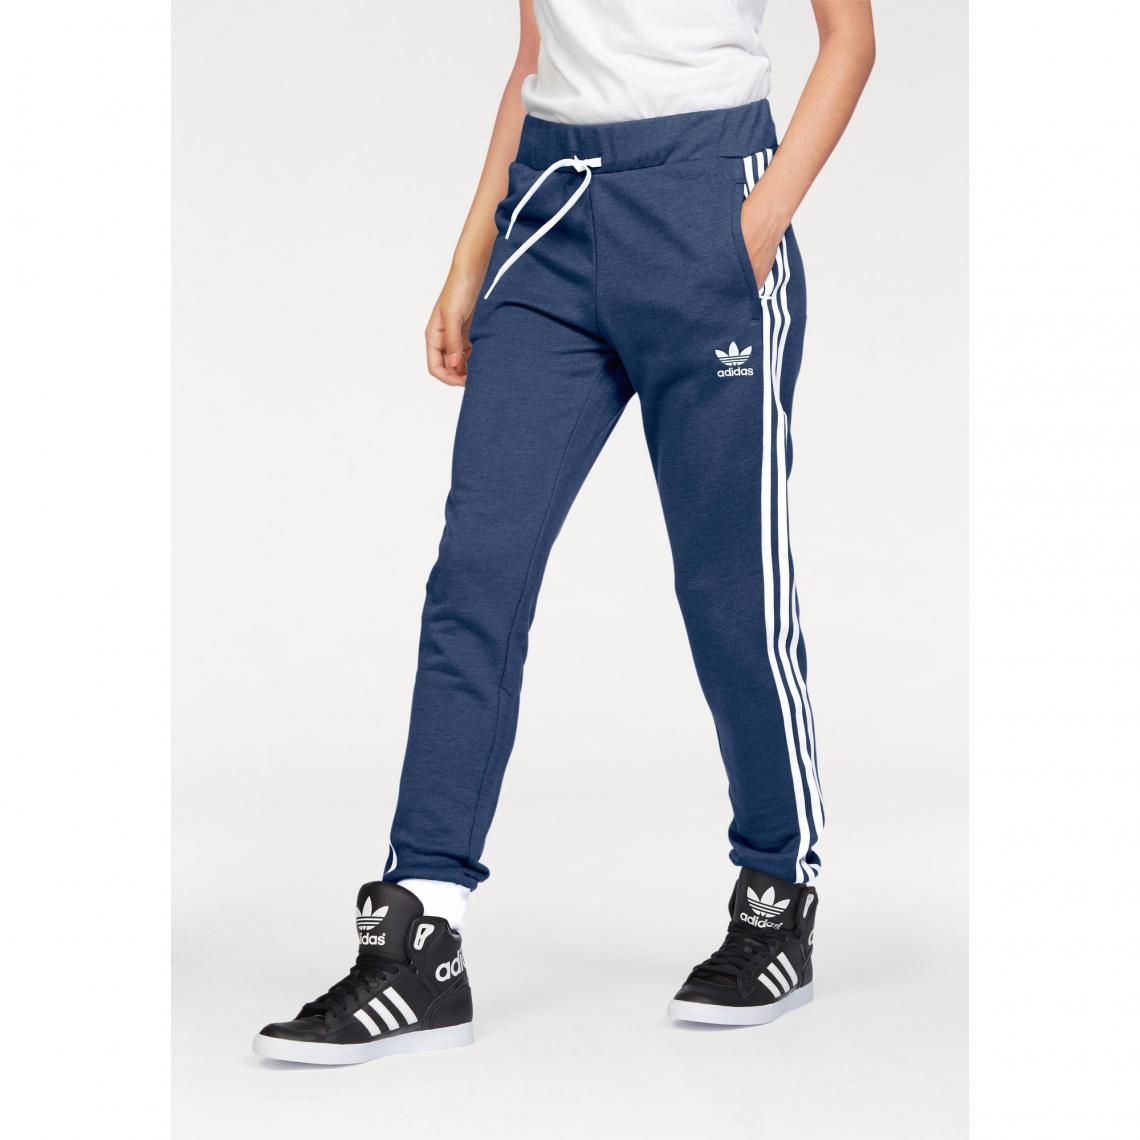 adidas original homme pantalon